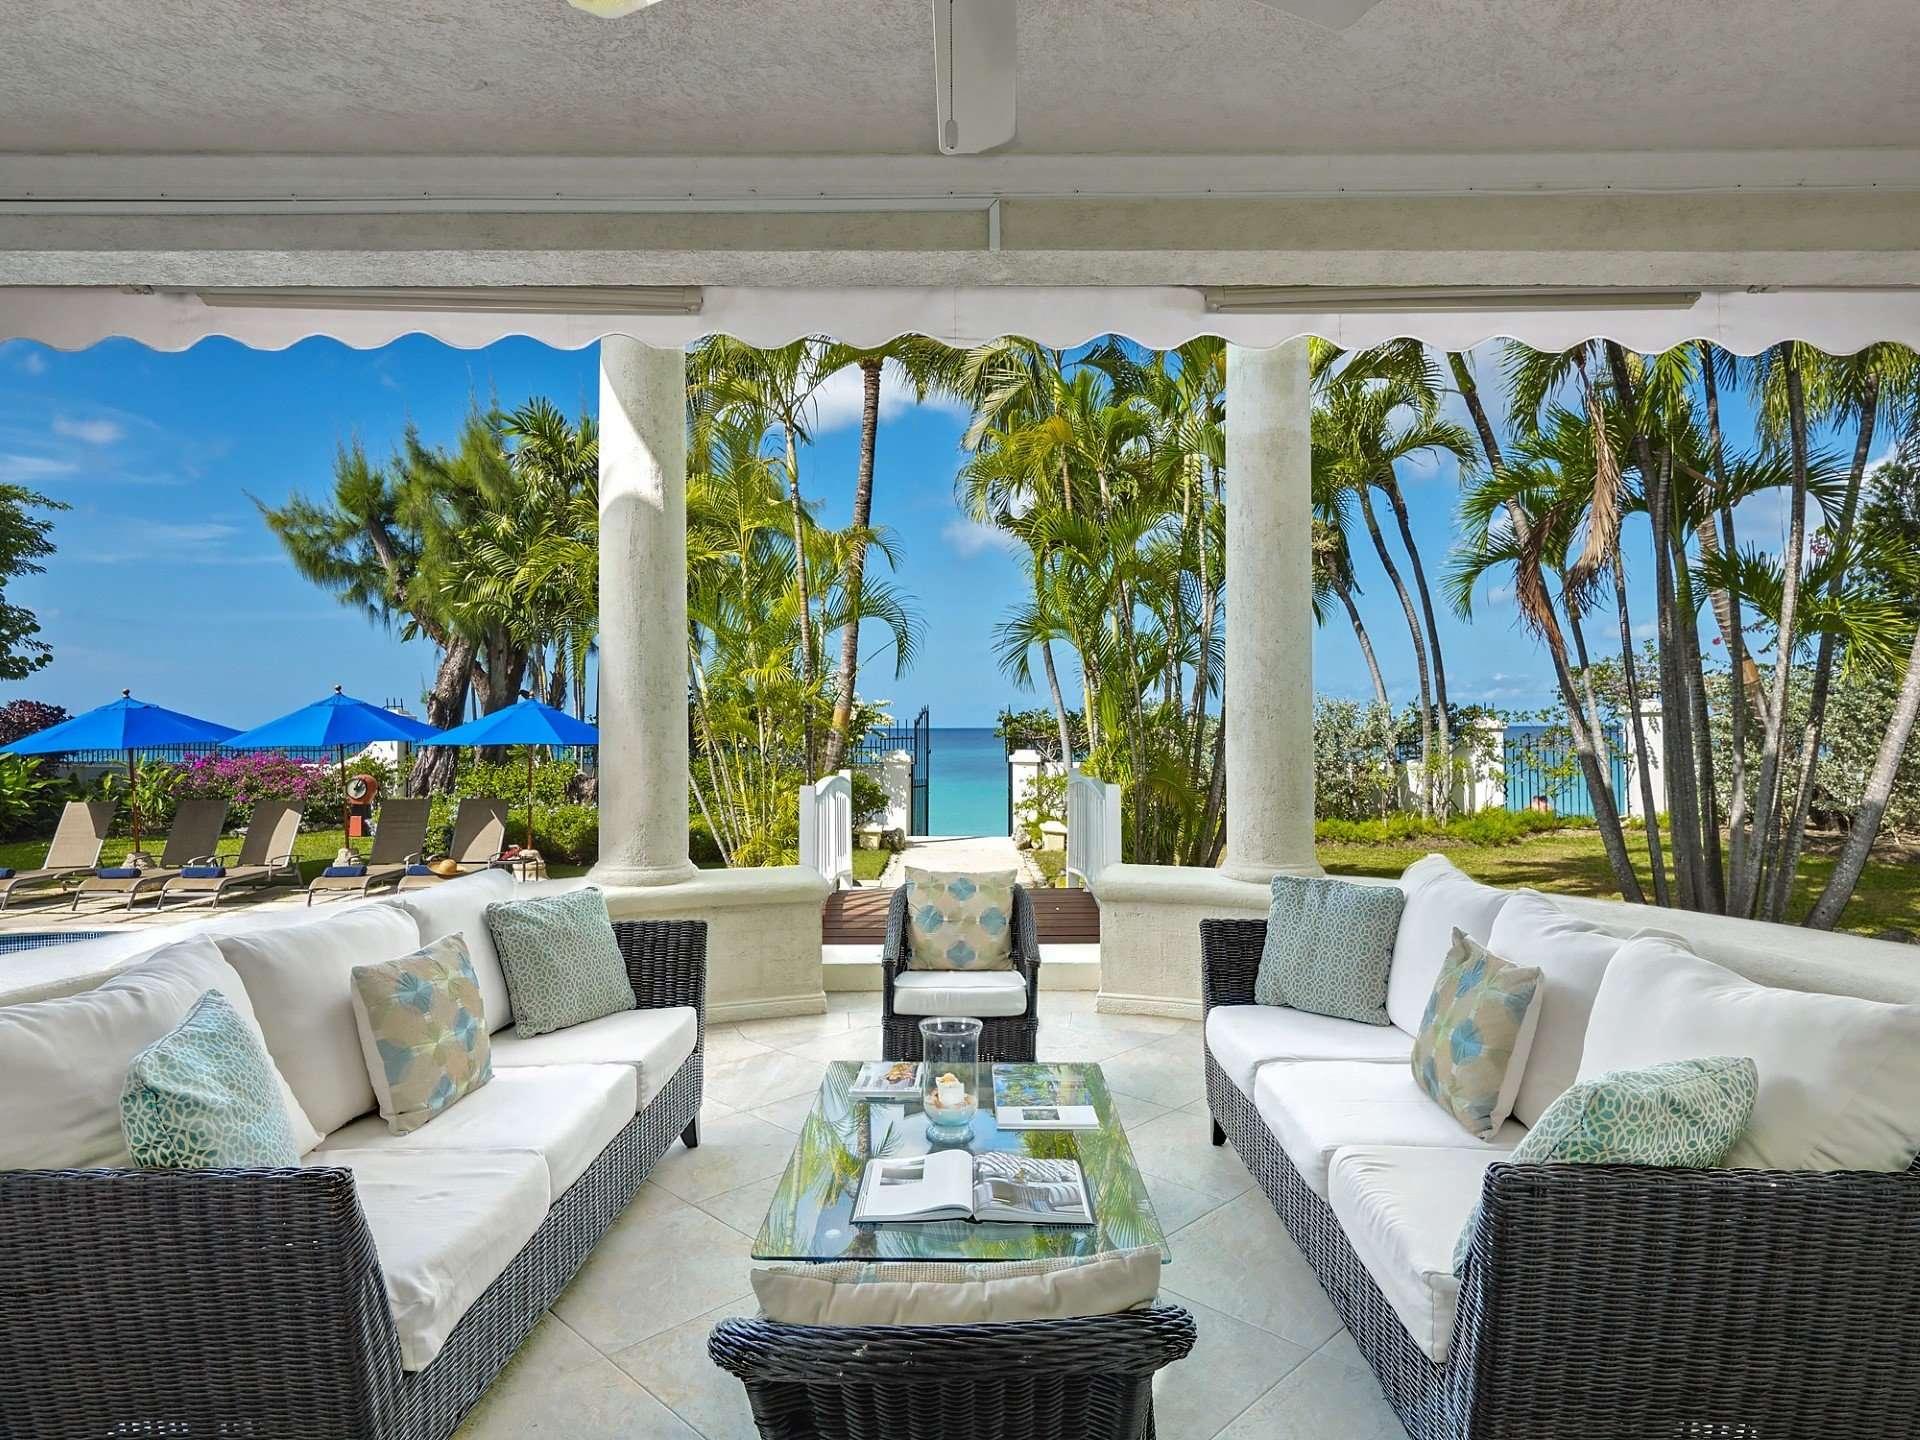 Luxury villa rentals caribbean - Barbados - St james - Paynes bay - New Mansion - Image 1/17